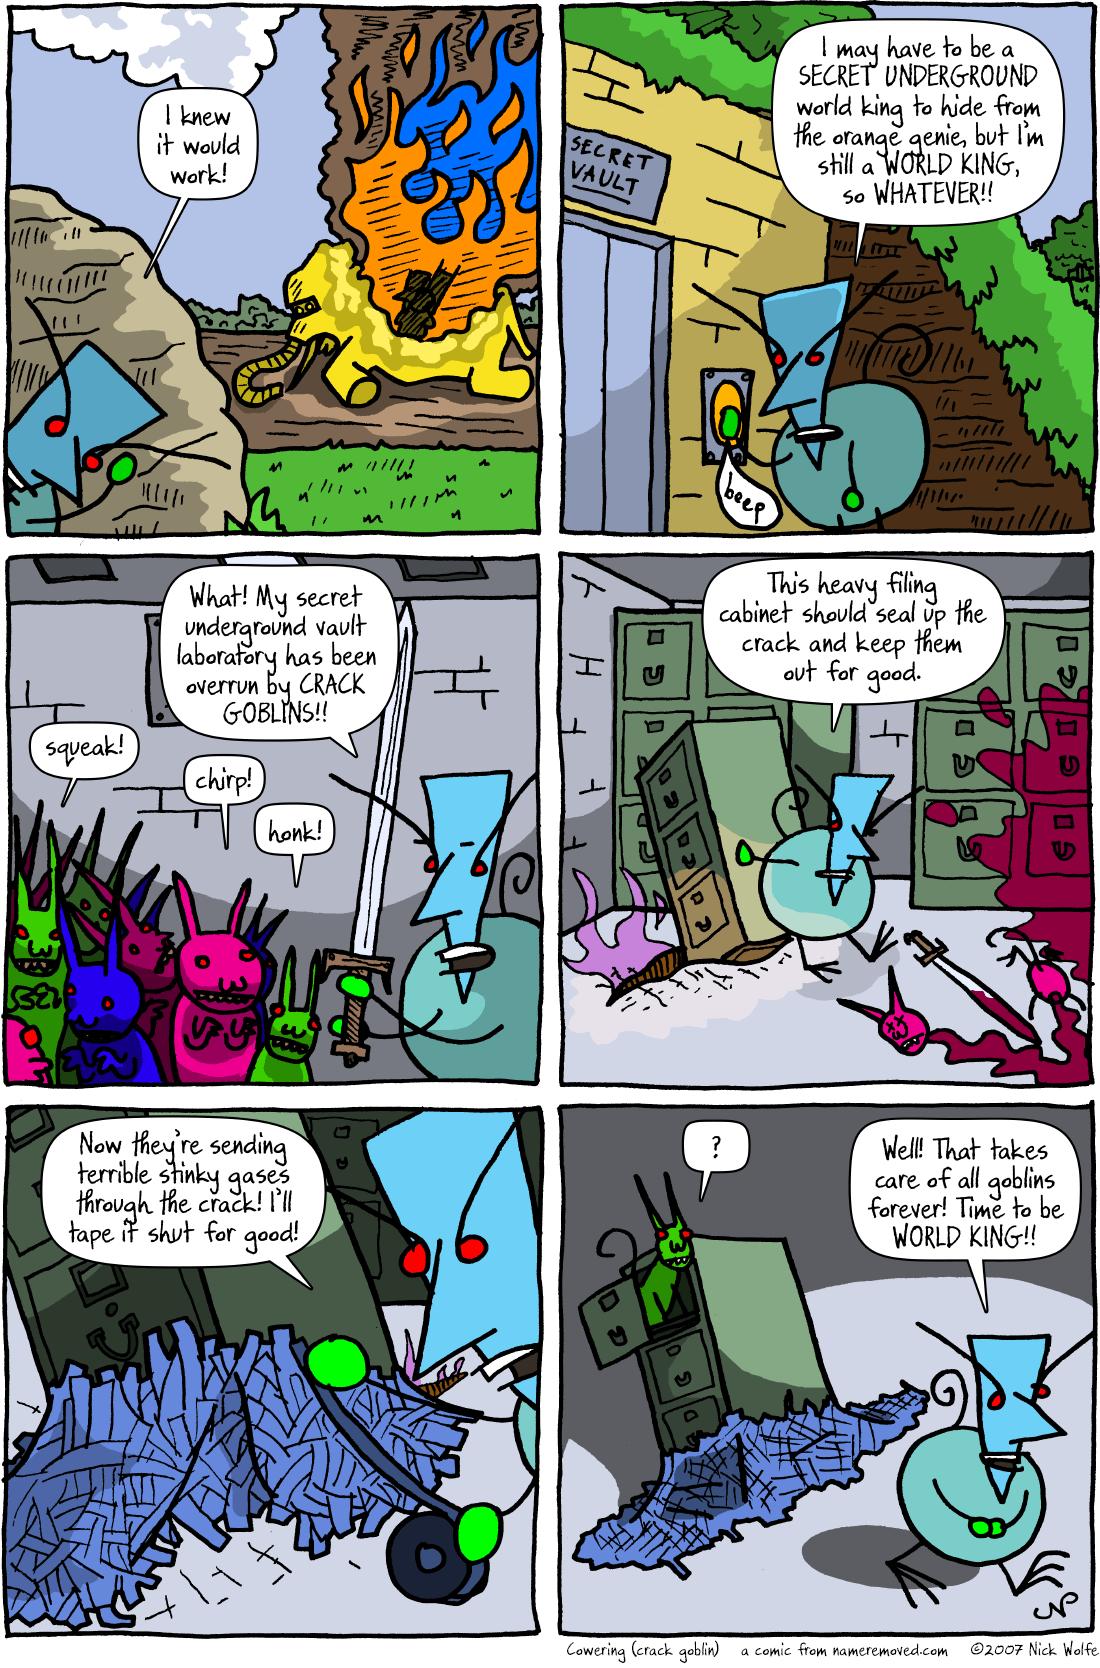 Cowering (crack goblin)